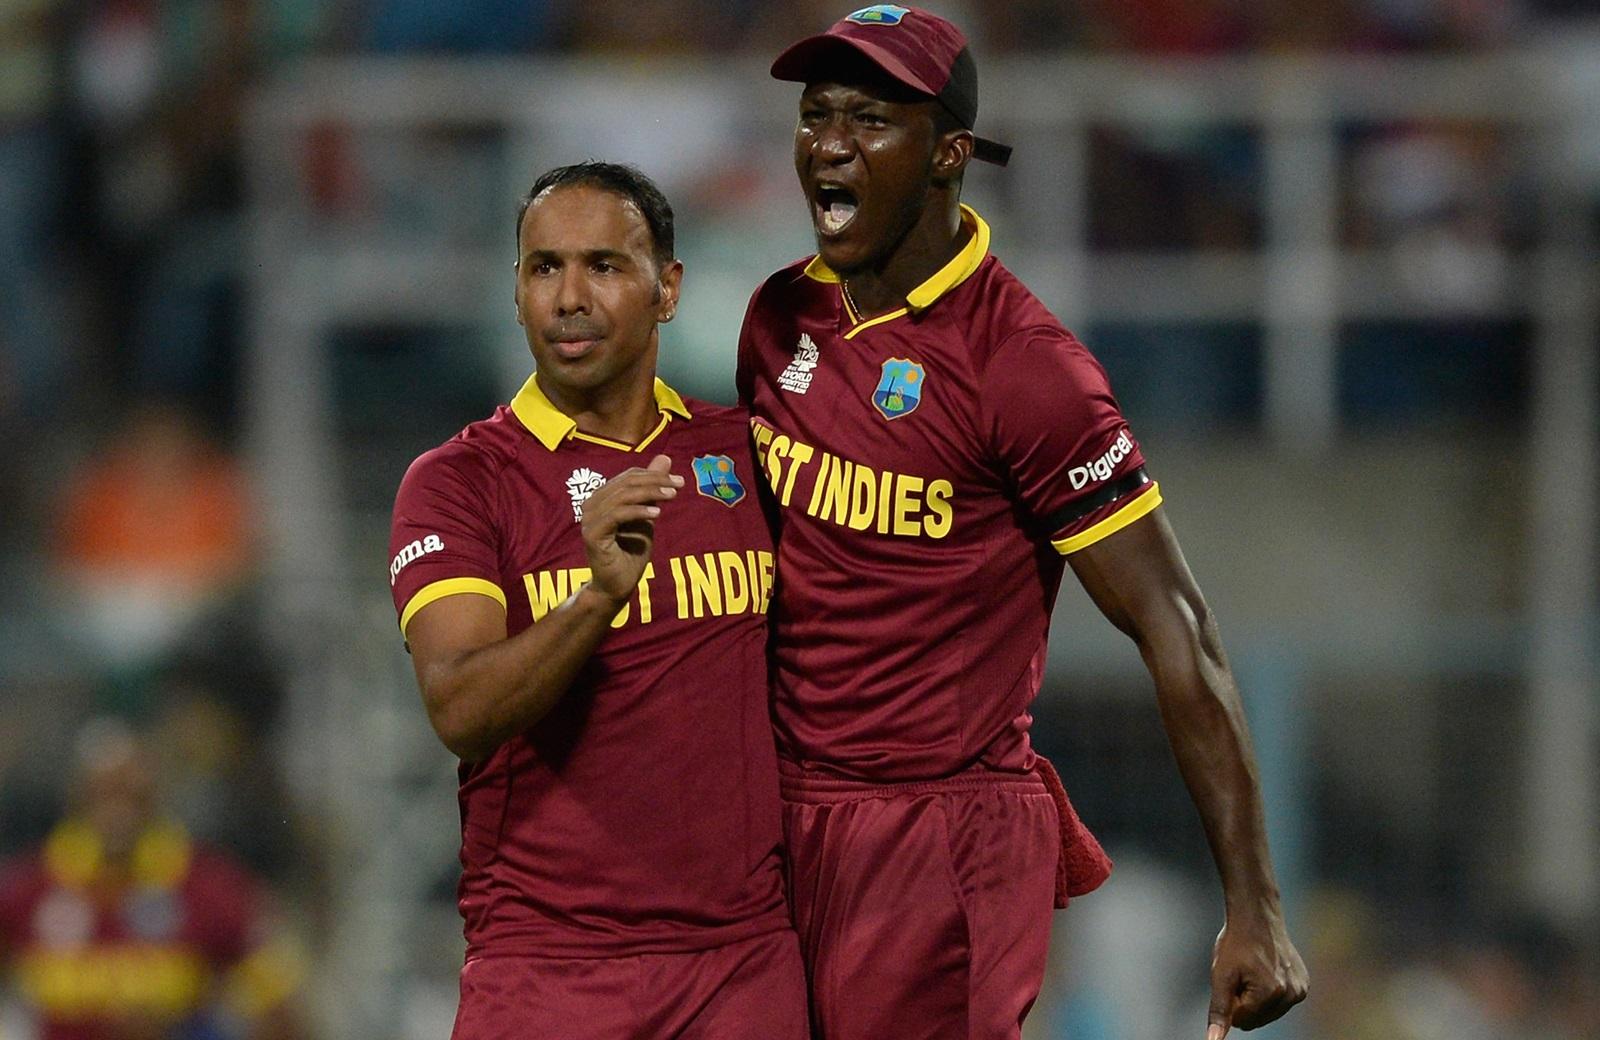 Badree, the Windies' unexpected champion   cricket.com.au